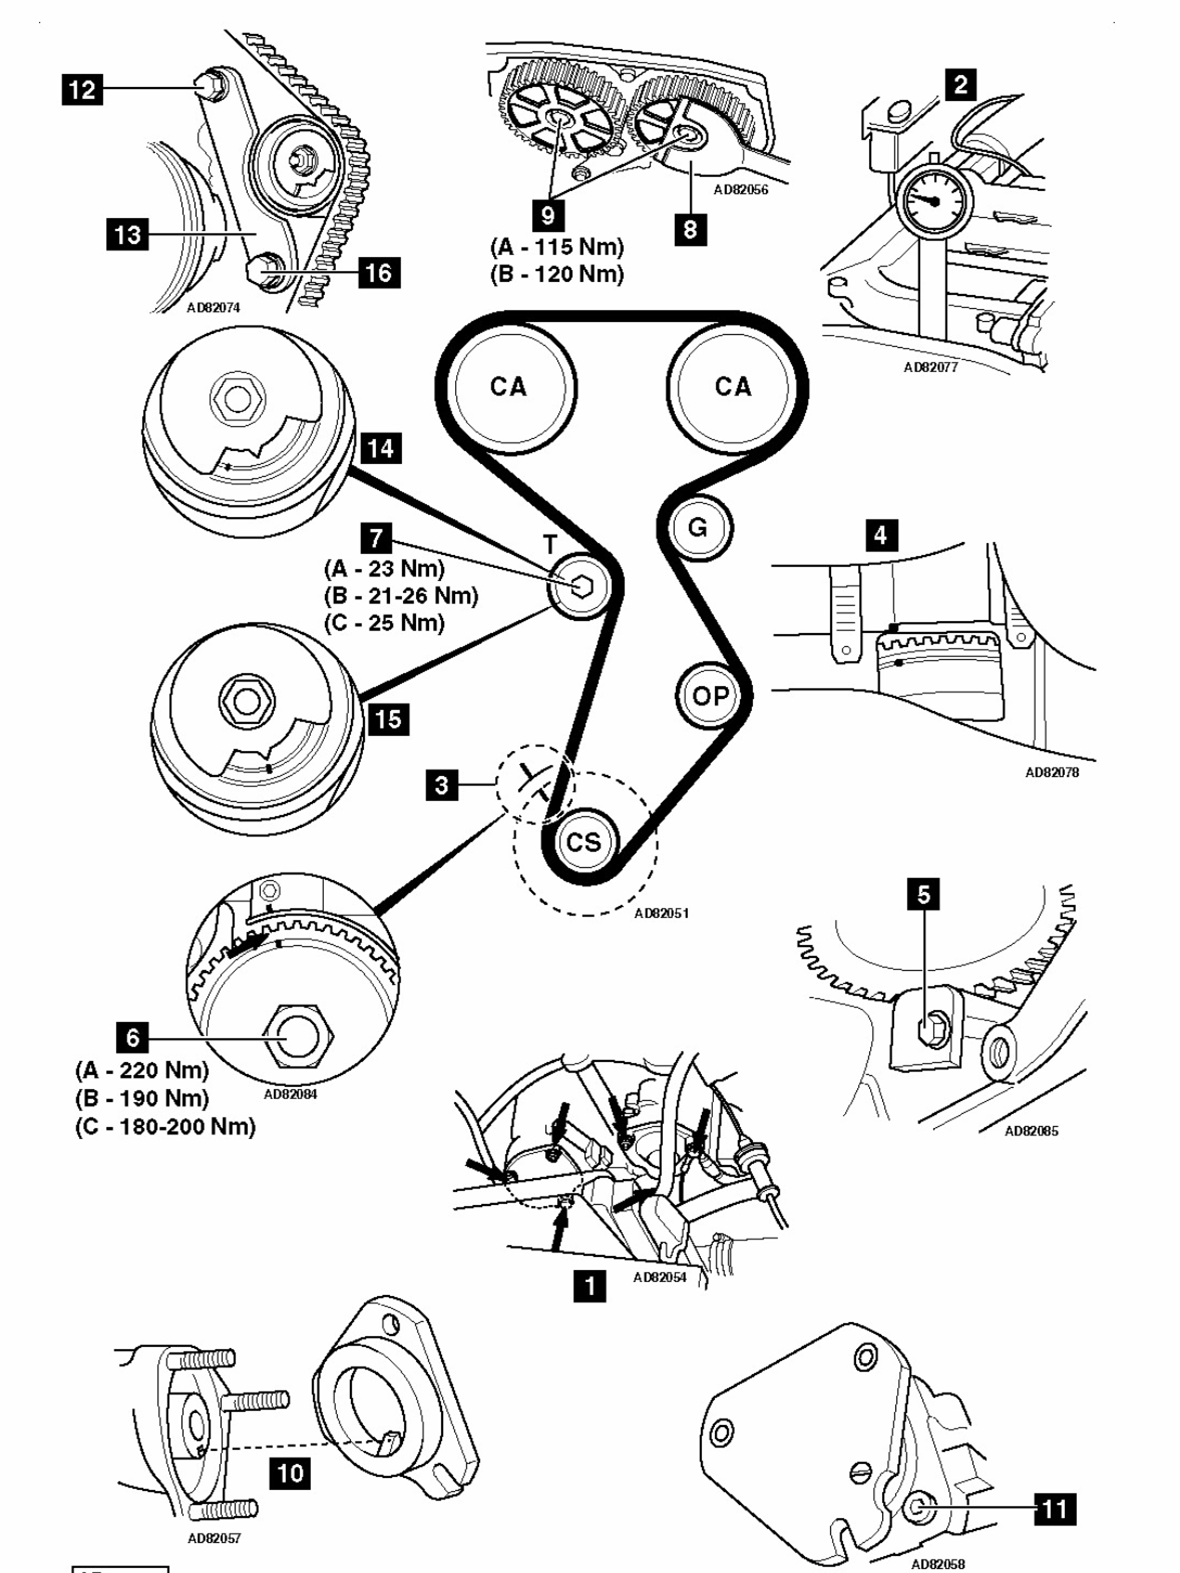 honda 16 valve Diagrama del motor